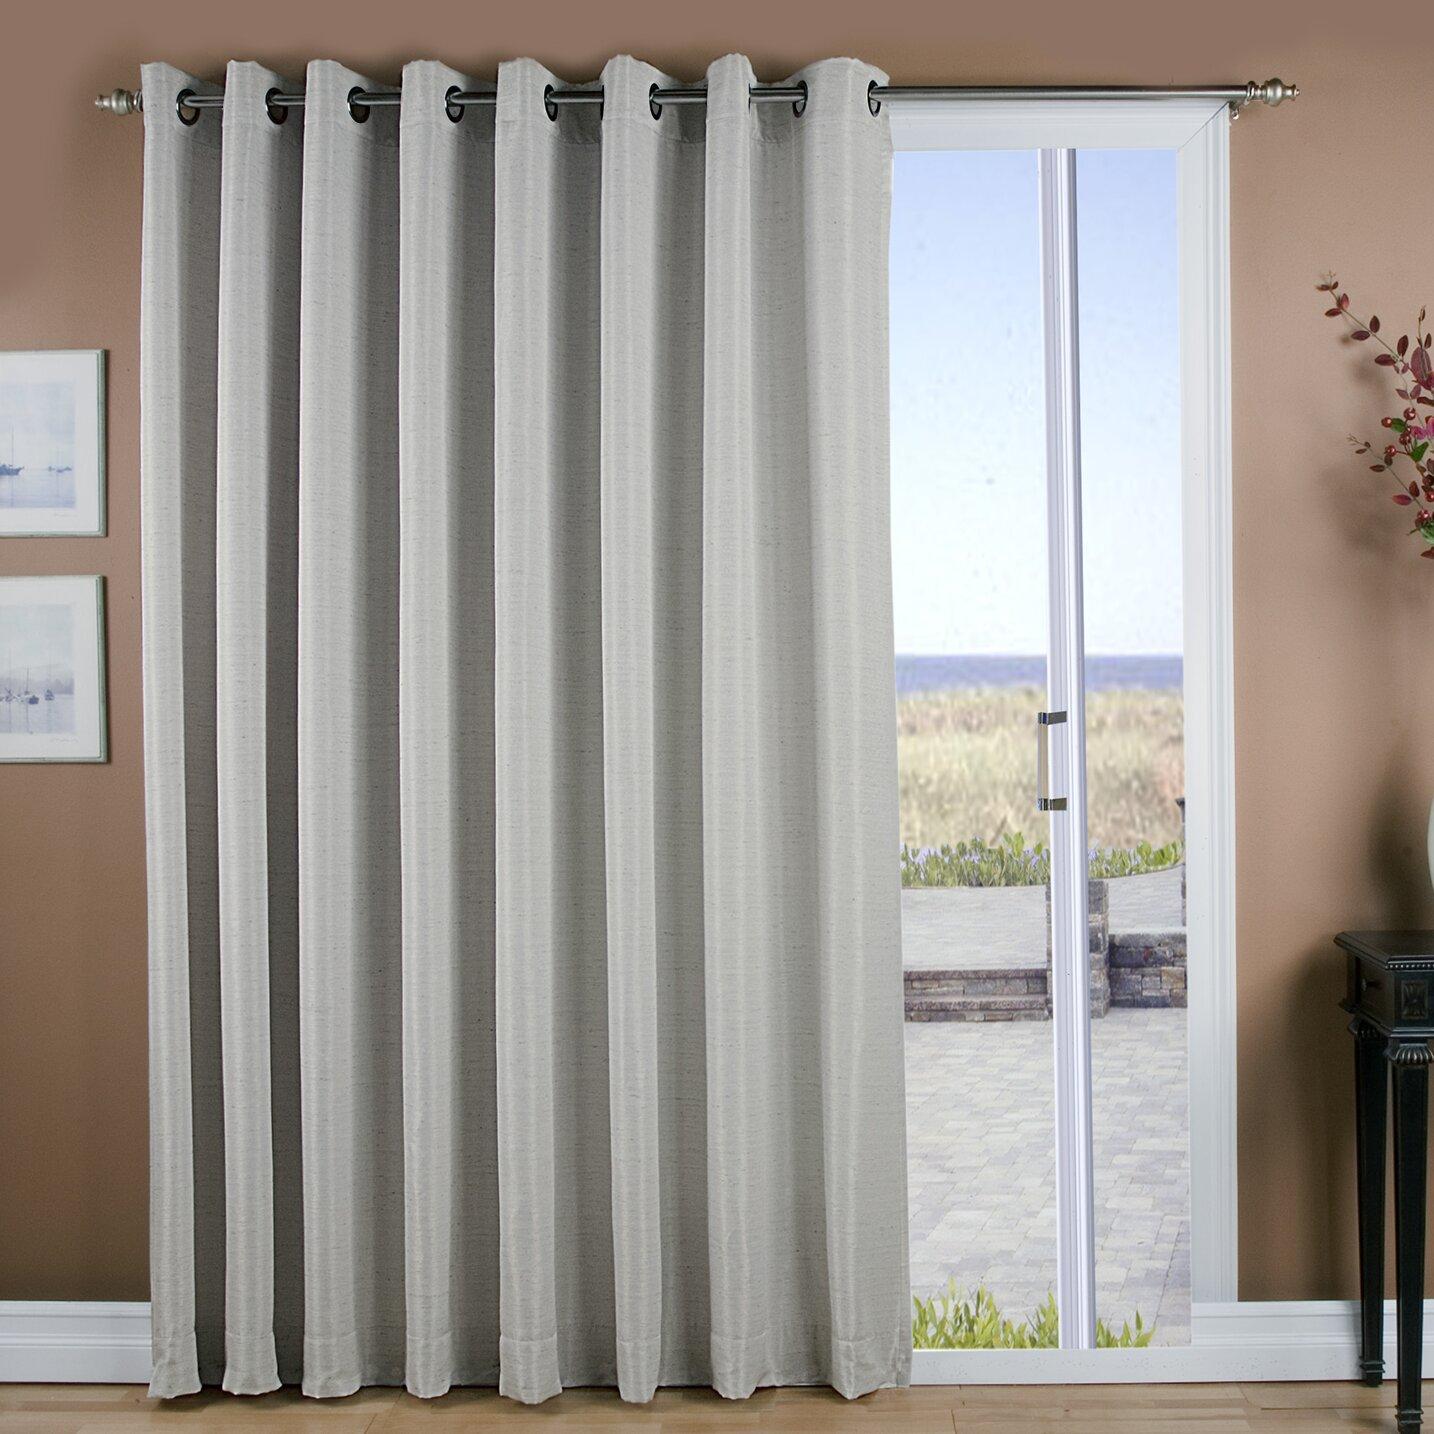 ricardo trading grasscloth lined grommet patio single curtain panel reviews wayfair. Black Bedroom Furniture Sets. Home Design Ideas